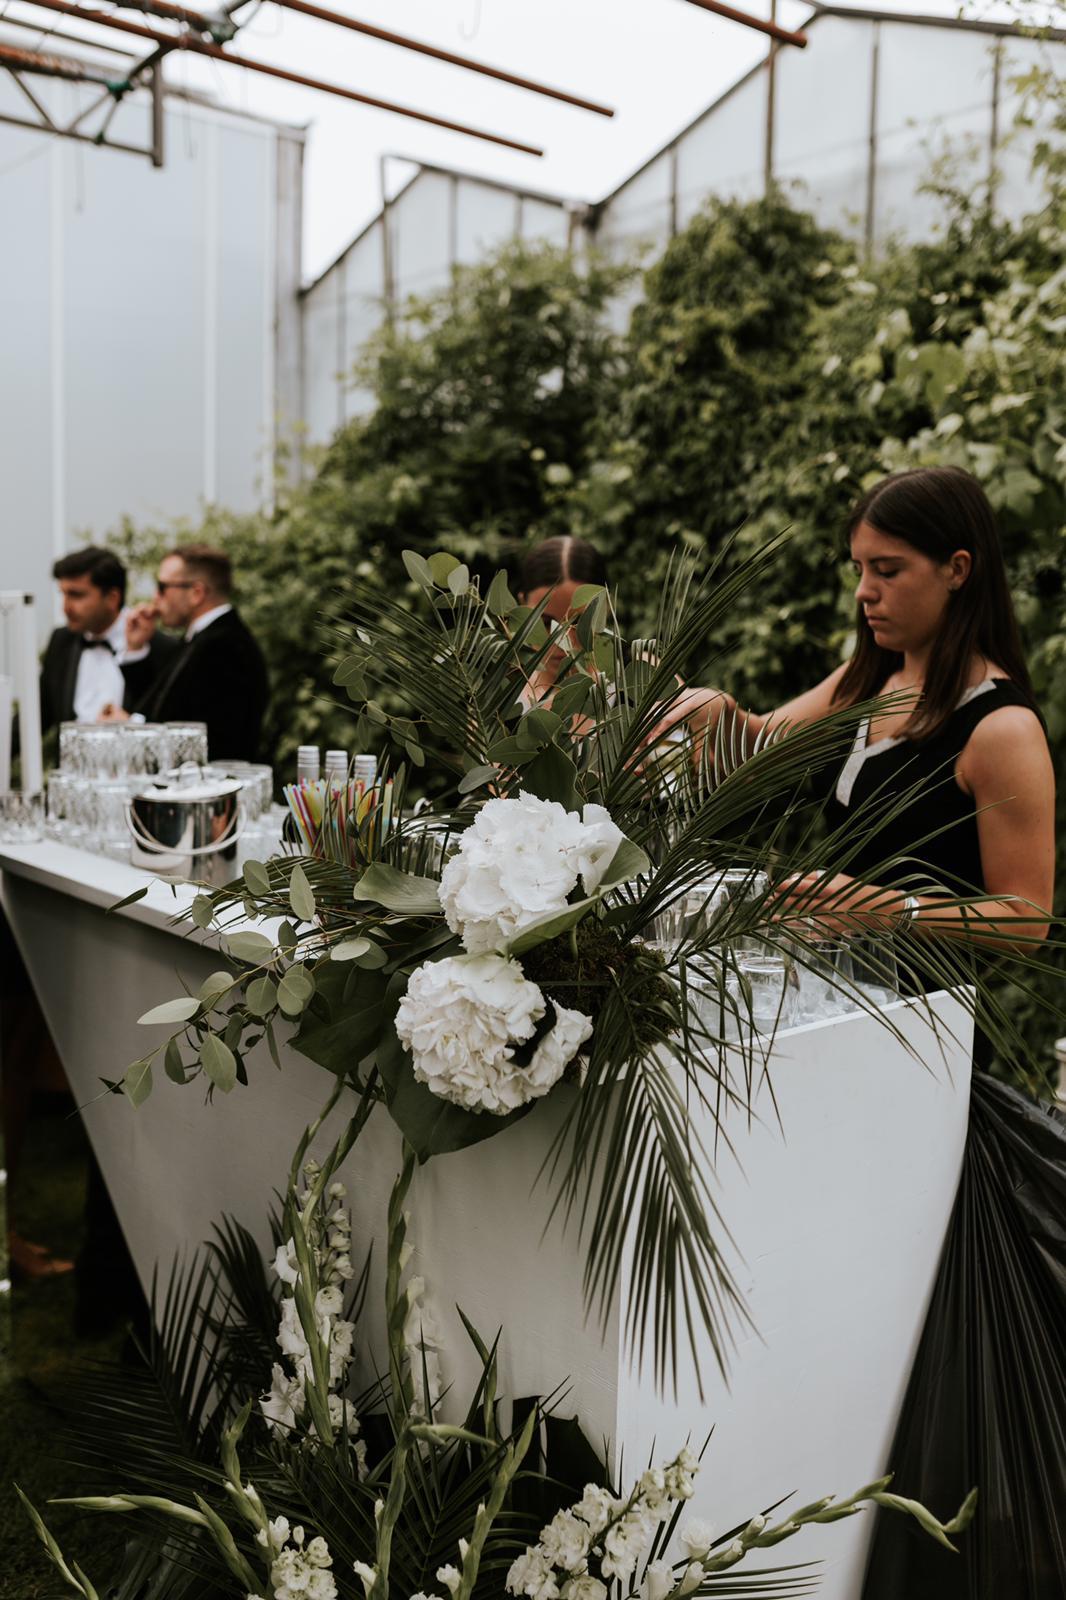 #apbloem #florist #bloemist #amsterdam #bloemenwinkel #kerkstraat #bloemen #flowers #weddingstyling #bruiloft #trouwen #liefde #bride #wedding #marriage #bruidsboeket #floraldesign #mordernwedding #modernbride #greenhouse #kas #planten #styling #interiorstyling #white #wit #bar